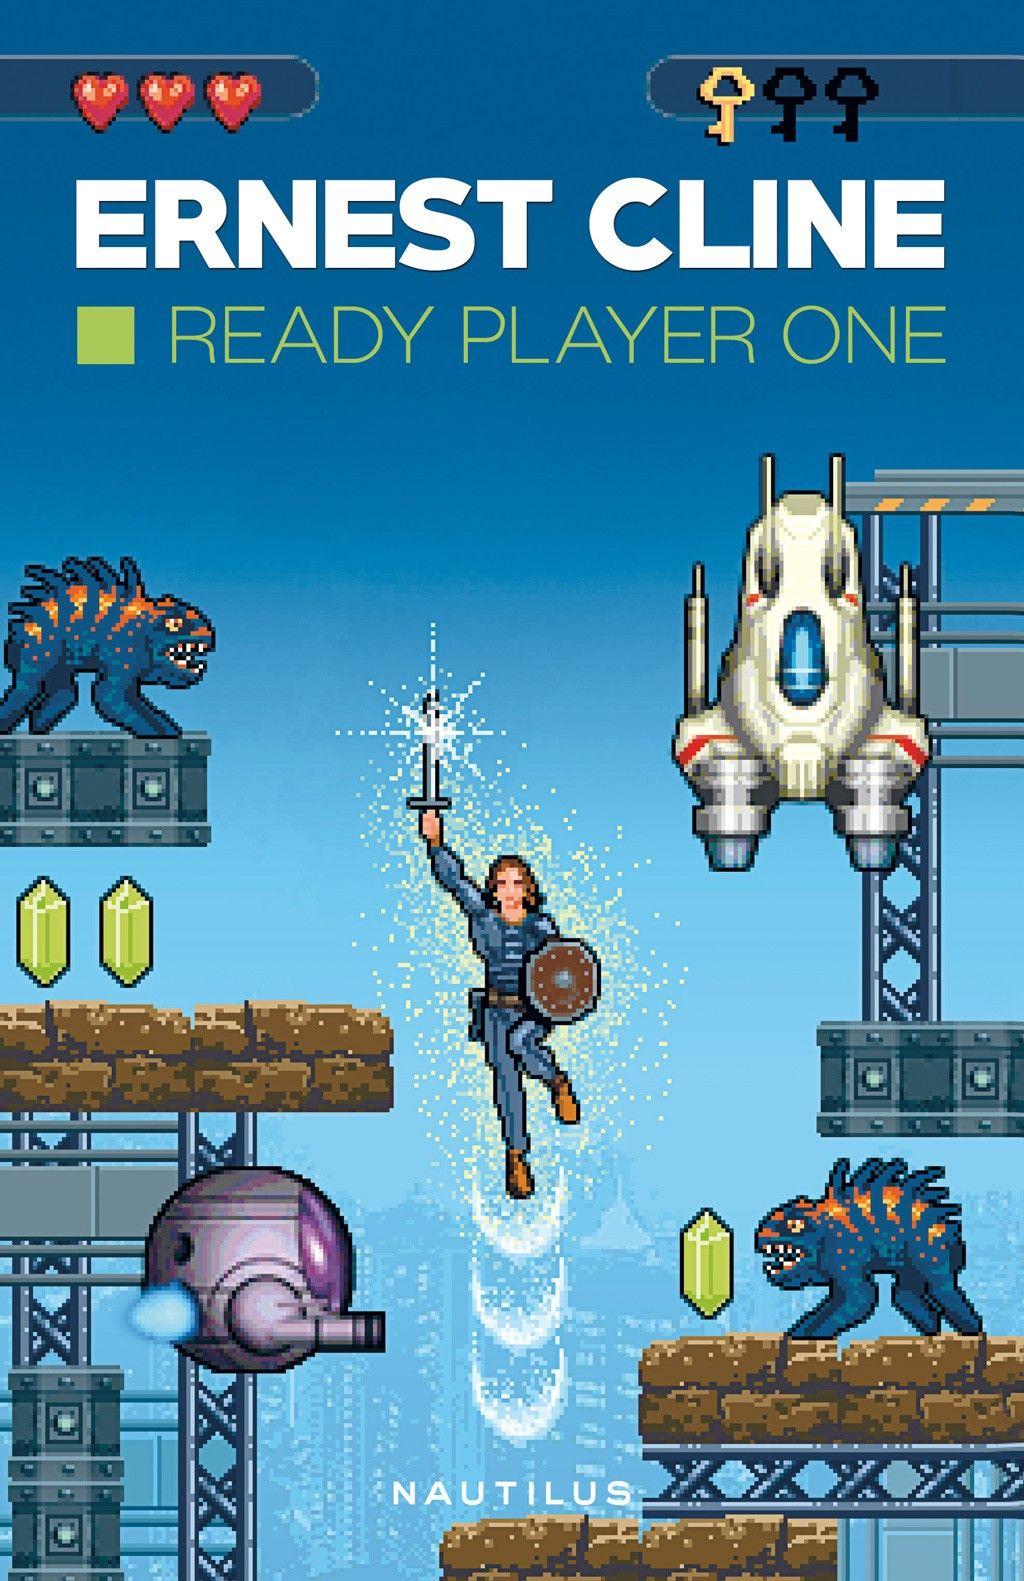 ce citește liviu 72 ernest cline ready player one blog ul fanului science fiction jogador numero 1 jogador n1 cinematica pinterest